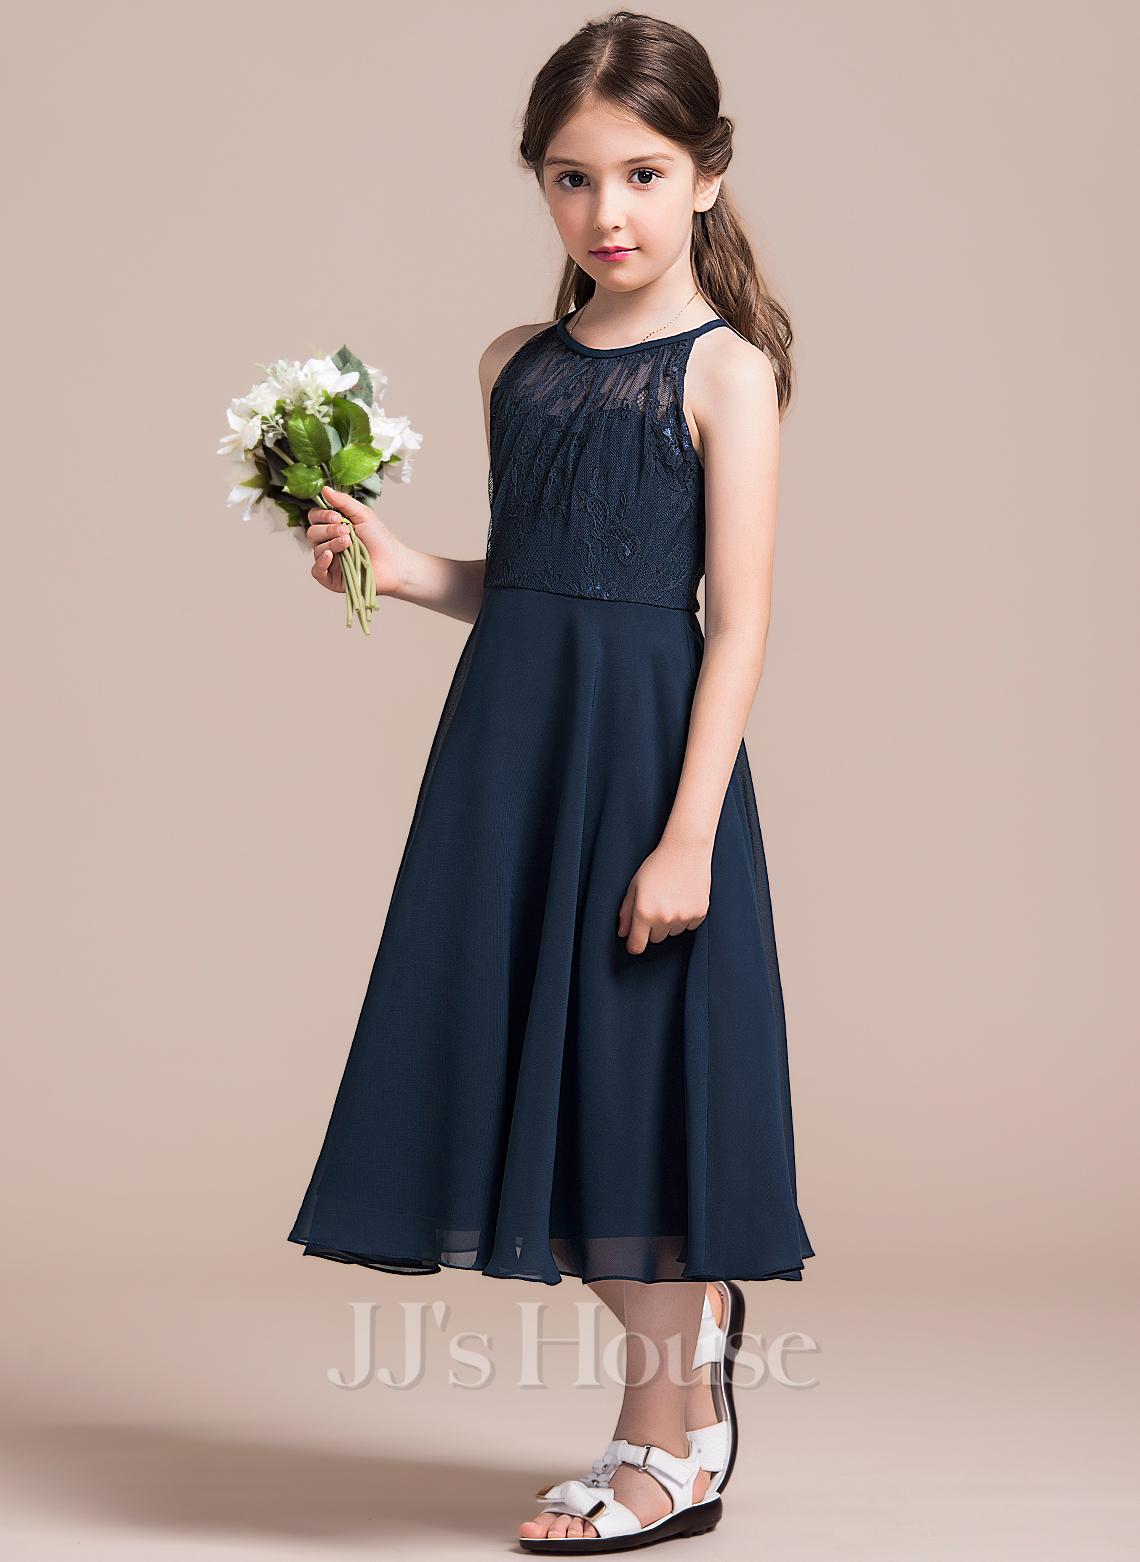 A-Line Scoop Neck Tea-Length Chiffon Lace Junior Bridesmaid Dress With Ruffle